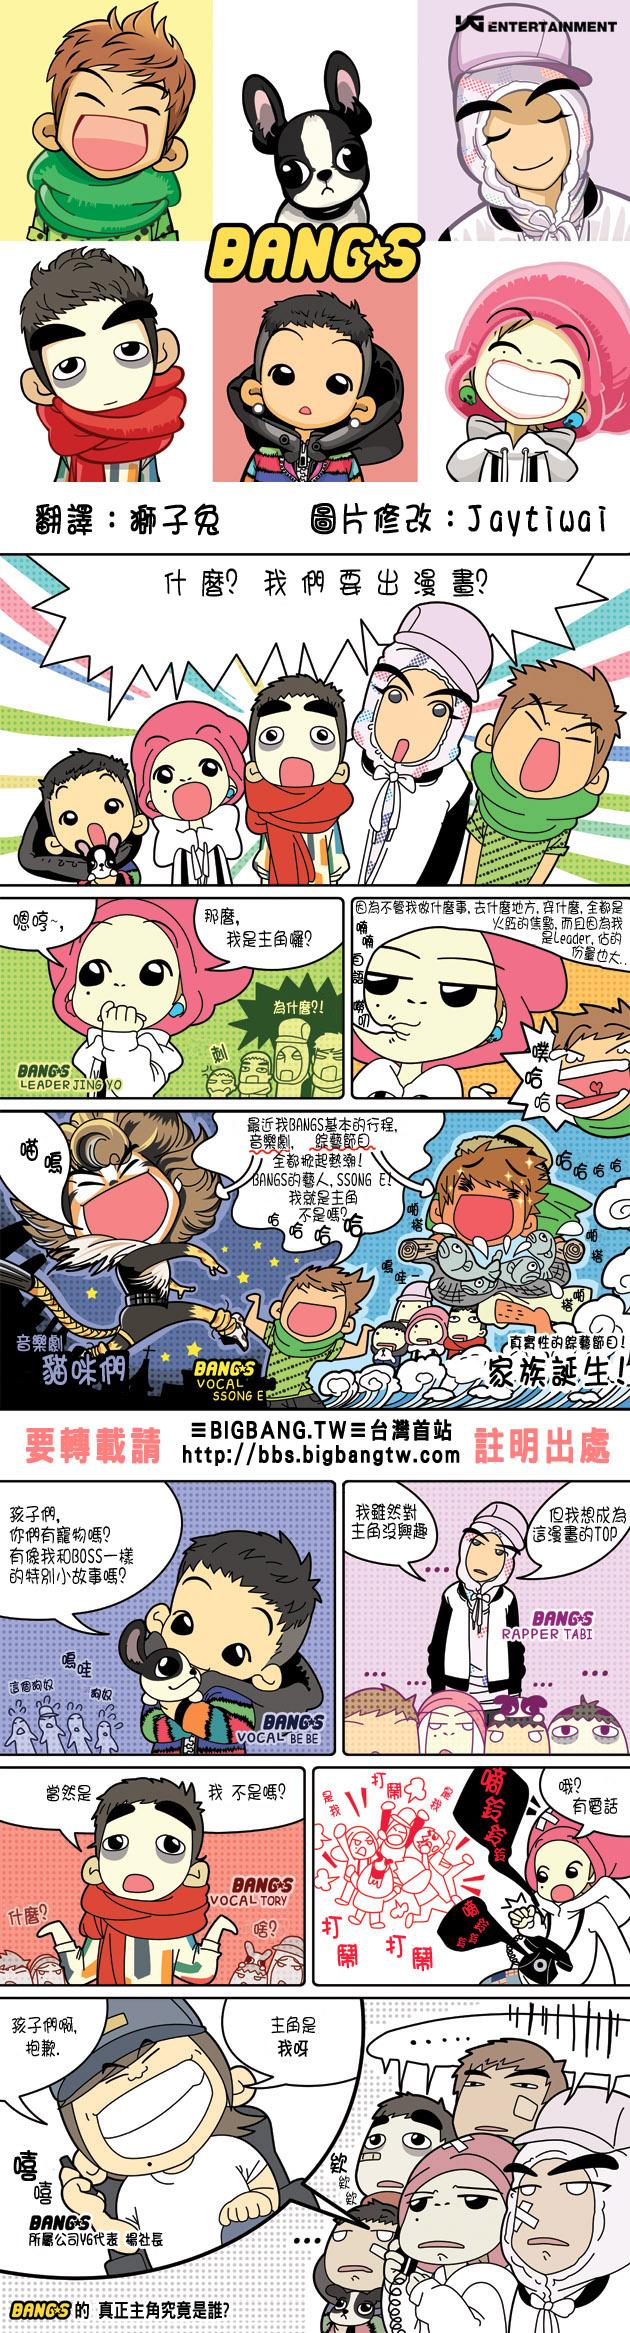 中譯 20090201_BANGS Comic 01.jpg